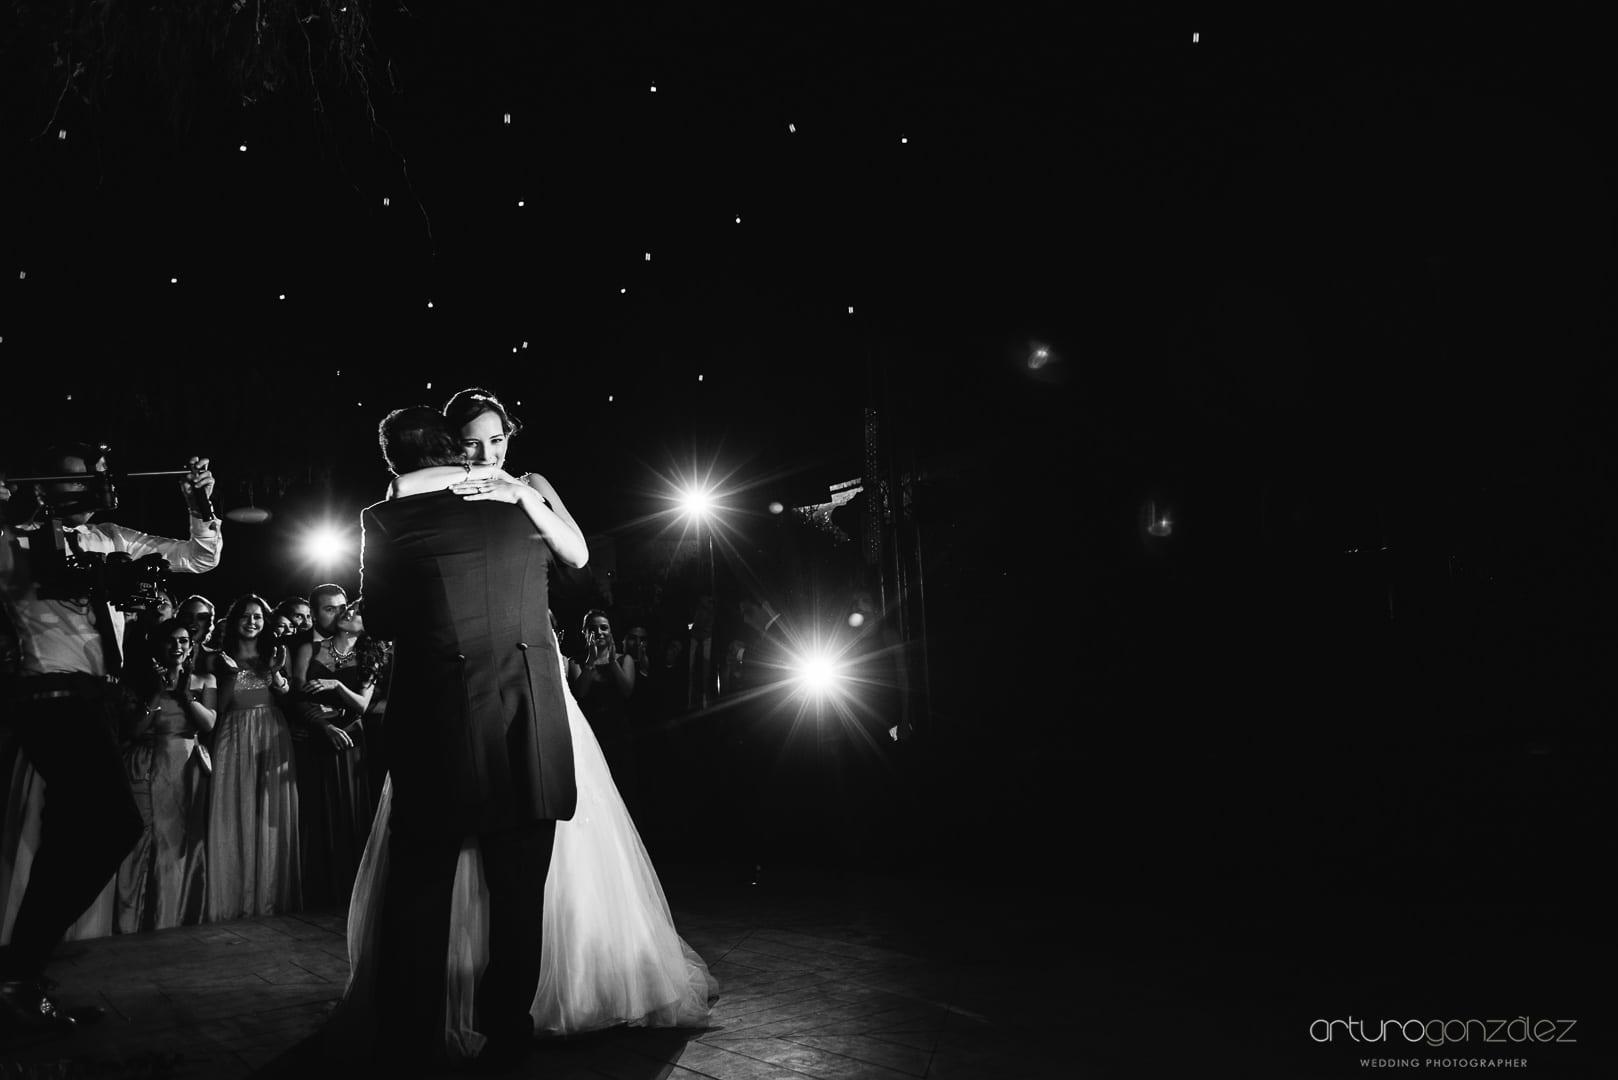 fotografo-de-bodas-en-guanajuato-119